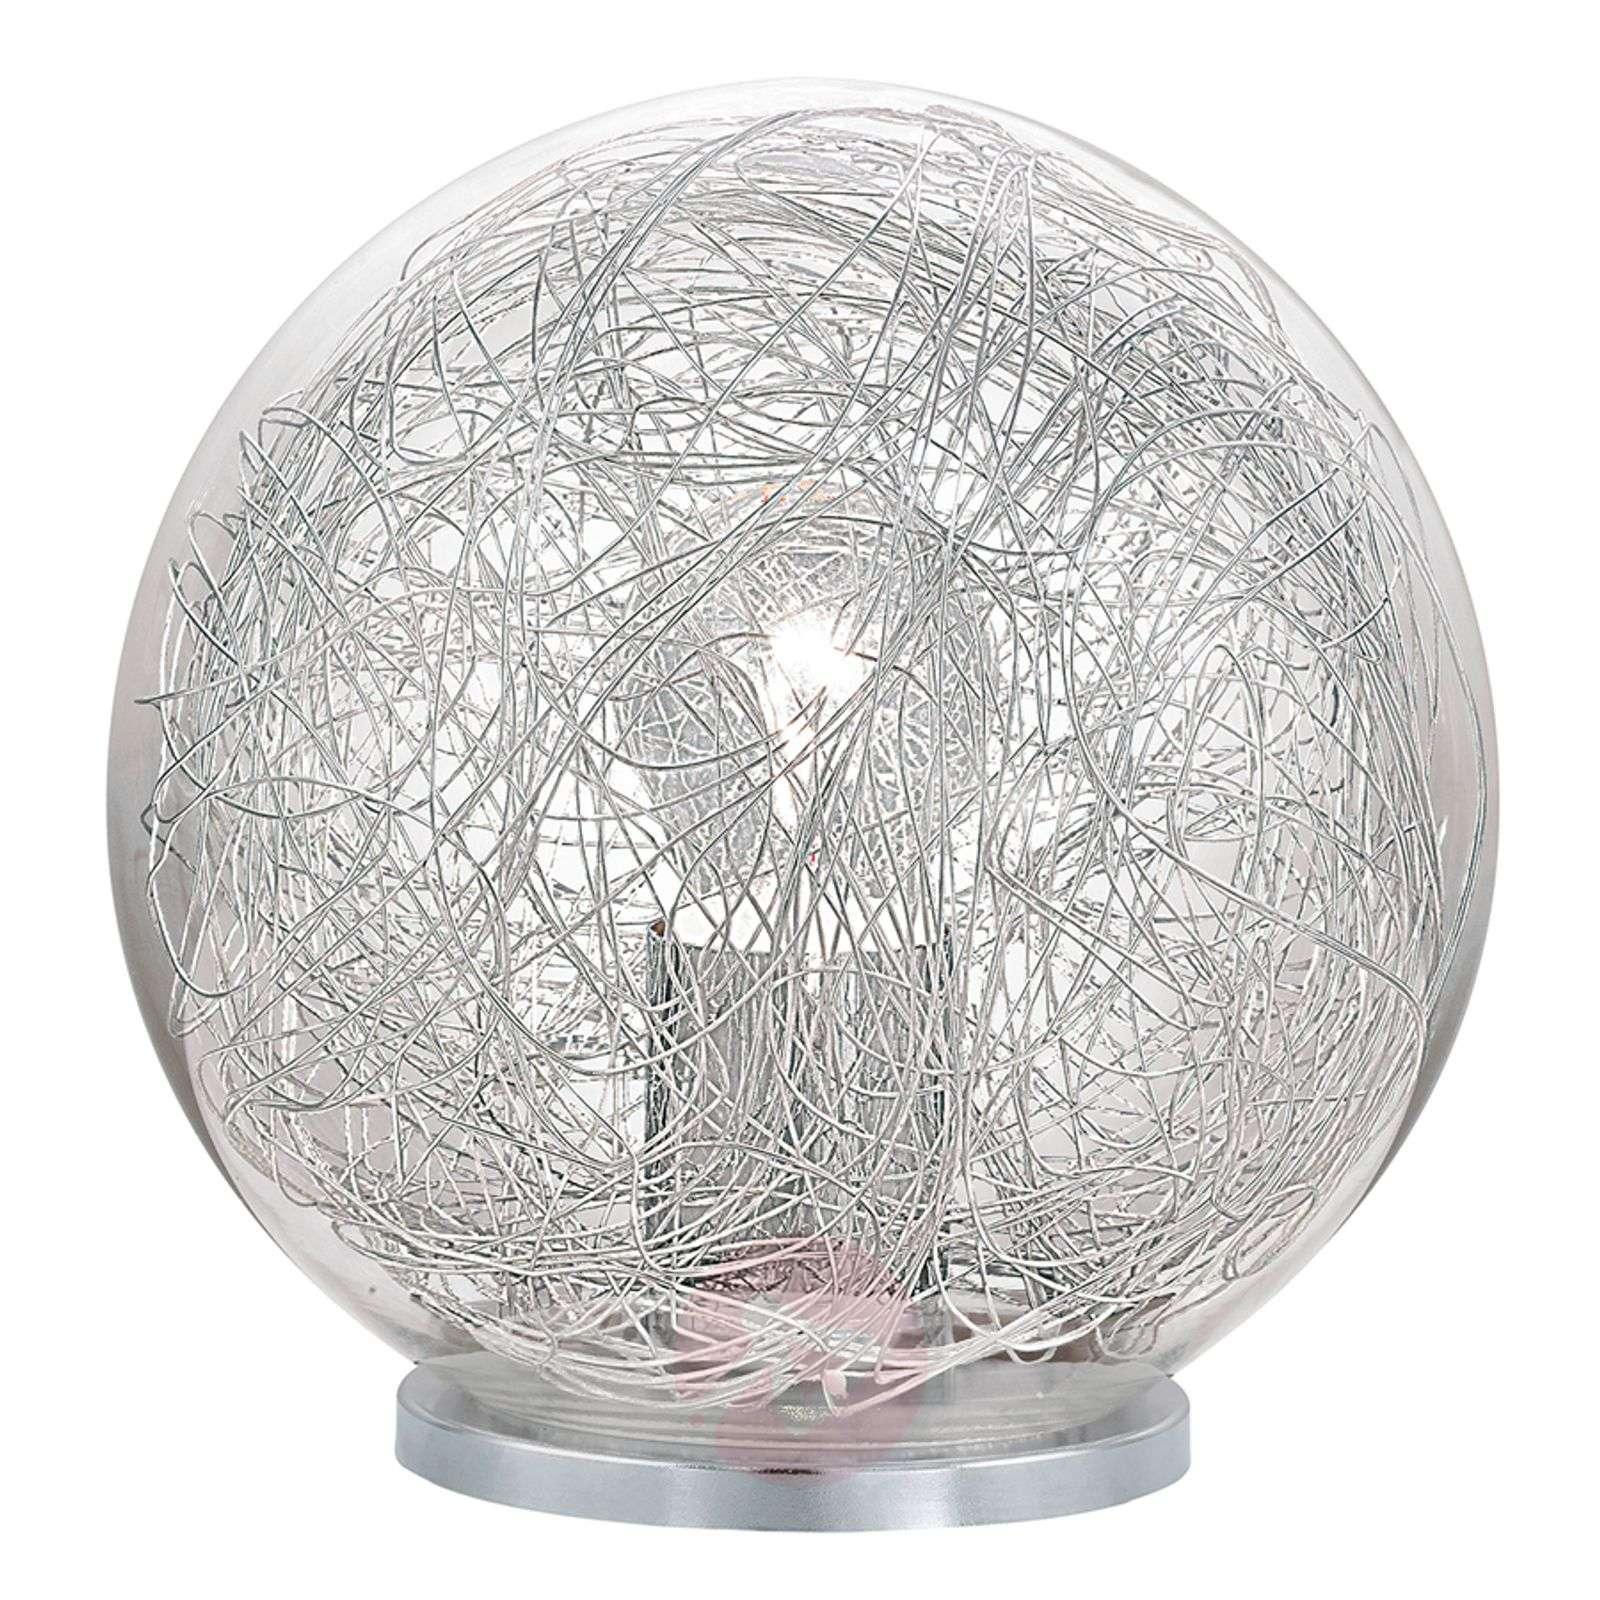 Luberio stylish, spherical table lamp-3031973-01